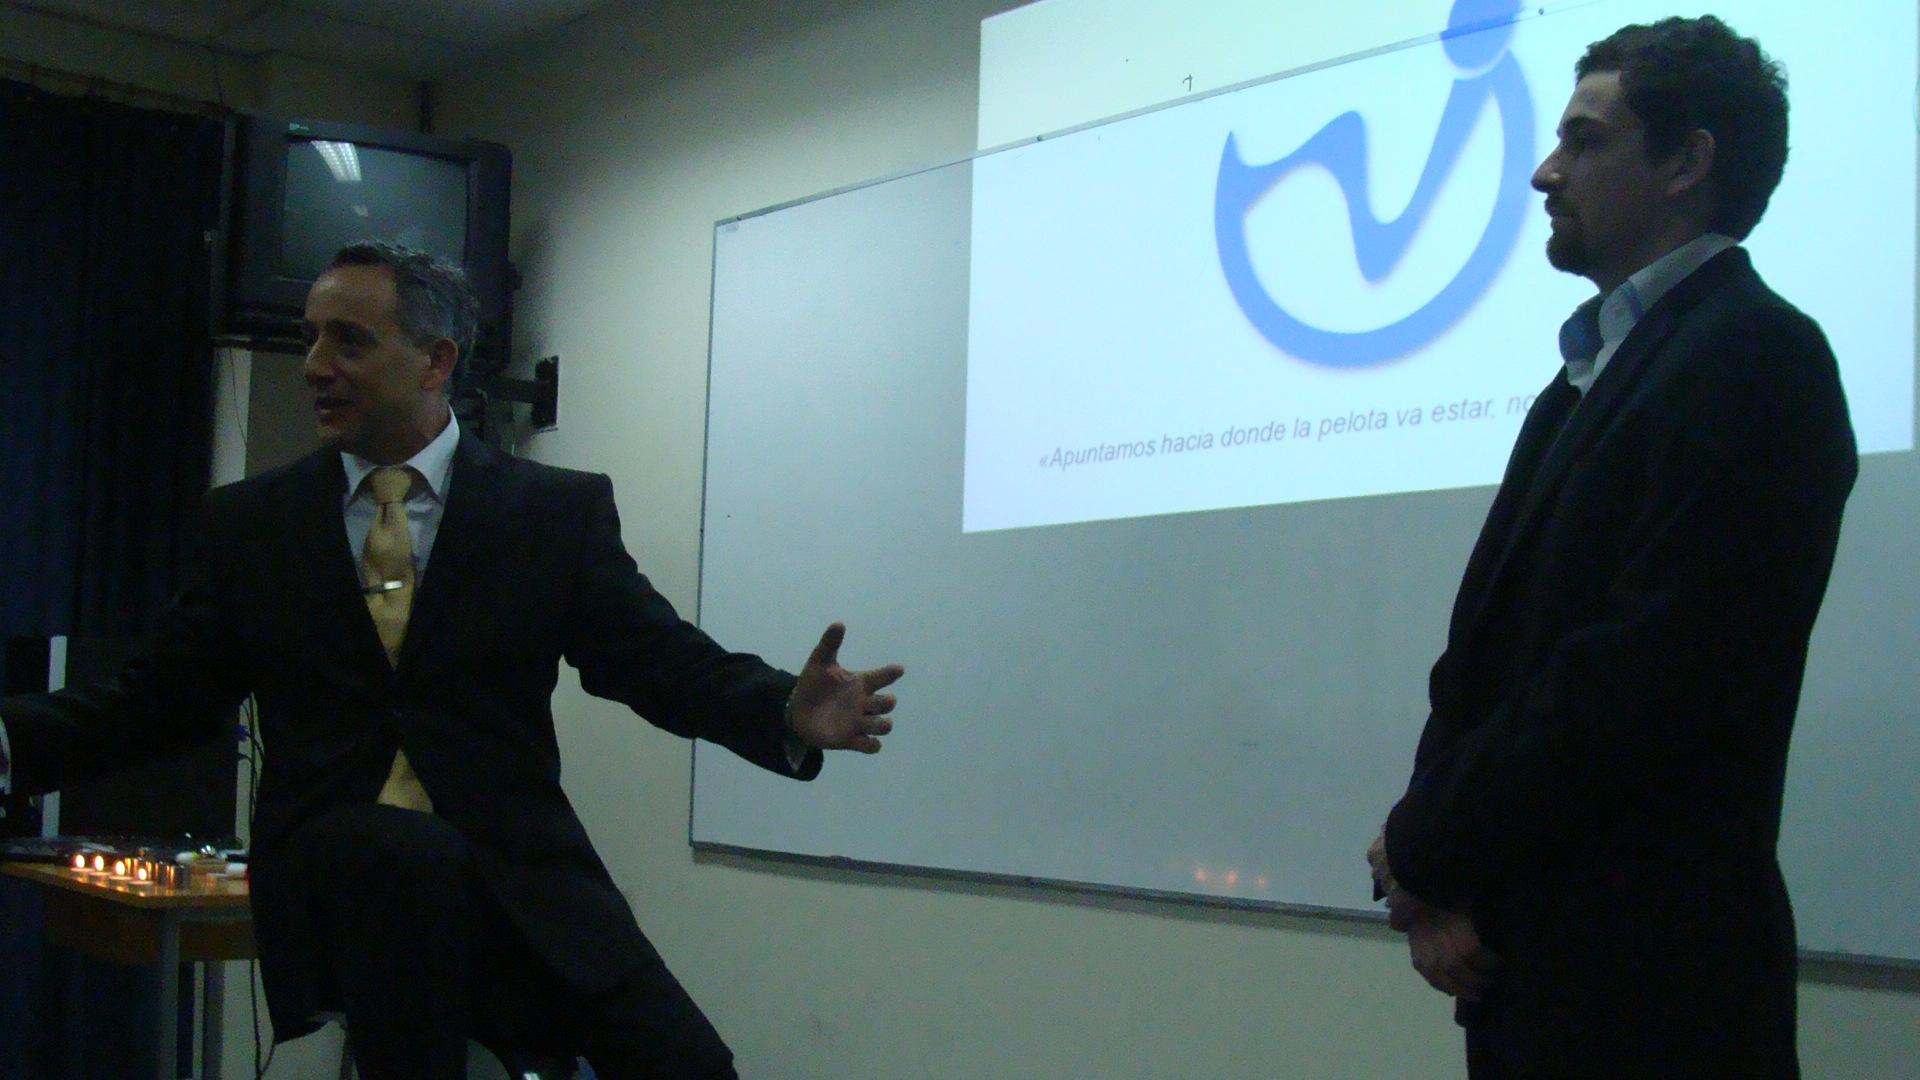 charla dia internacional del movimiento - kinesiologia - kinesiologos - universidad iberoamericana de ciencias y tecnologia - sergio zuñiga toro kinesicwork.JPG